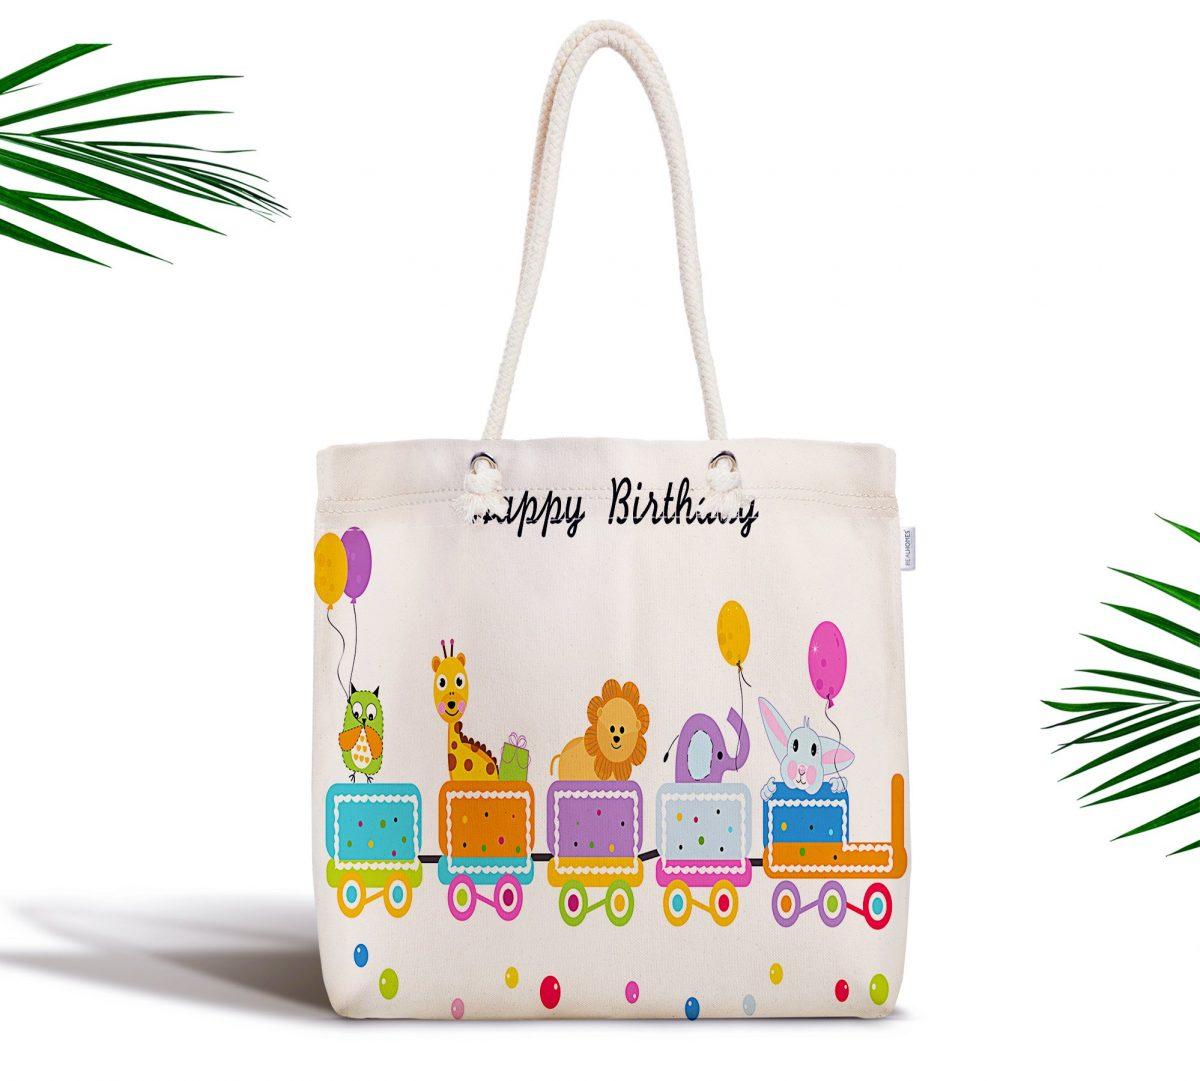 Happy Birthday Dijital Baskılı Fermuarlı Kumaş Çanta Realhomes